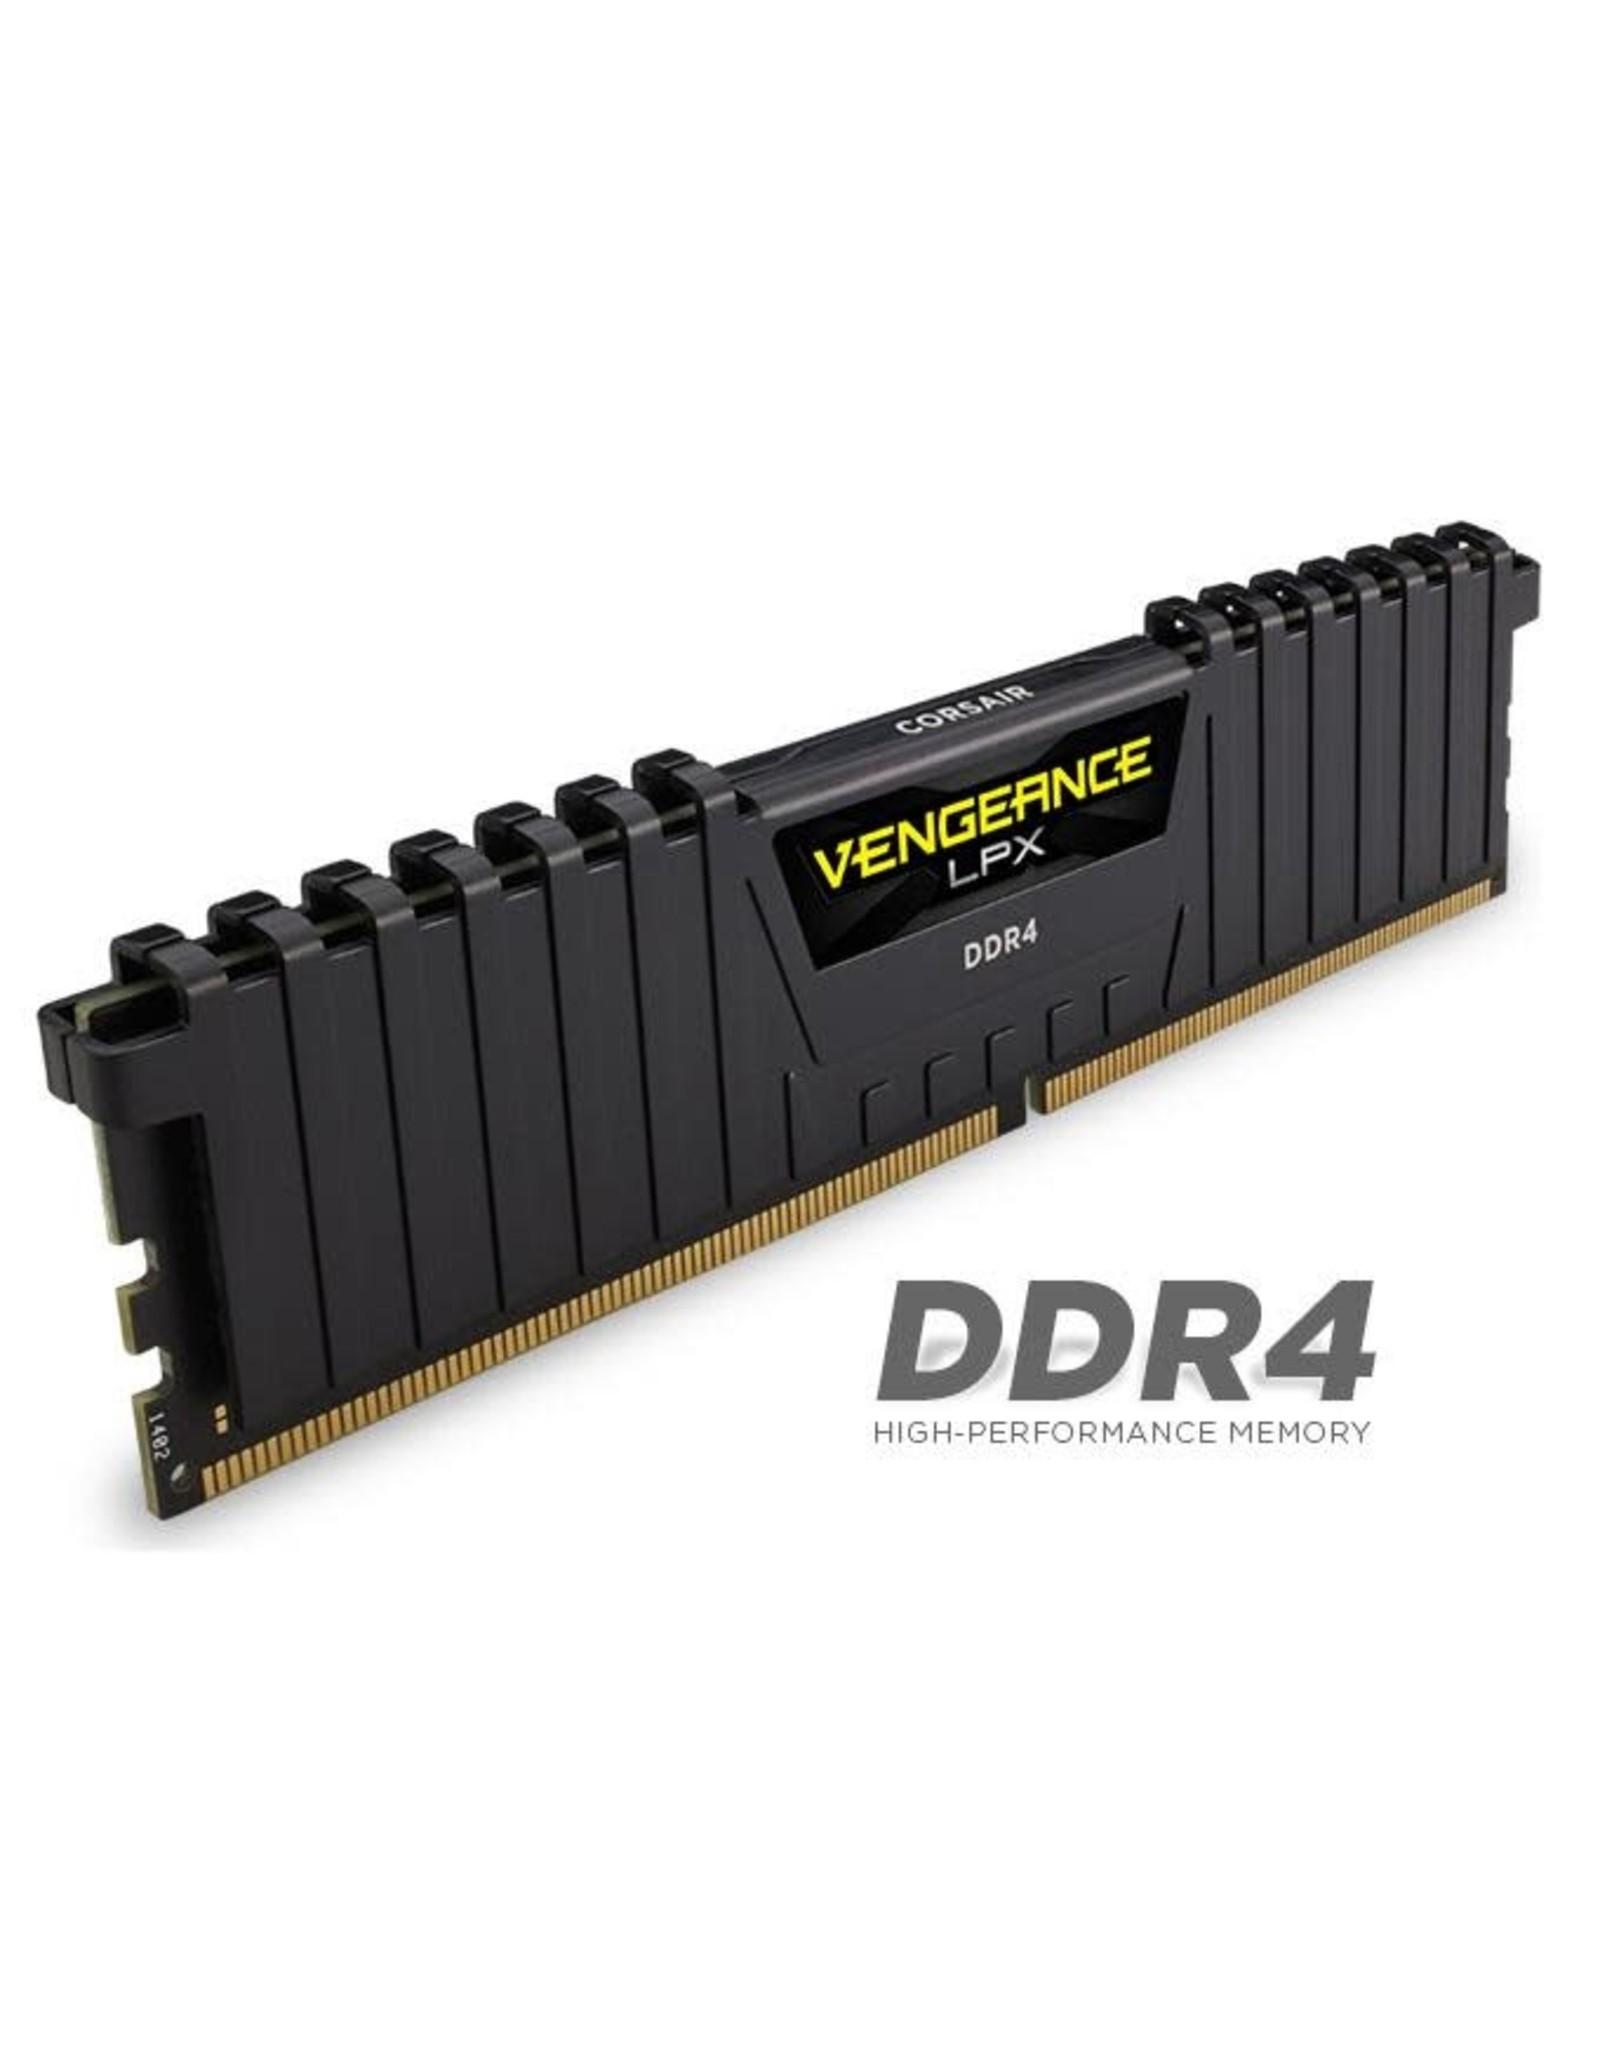 Corsair Corsair Vengeance LPX 16GB DDR4 DRAM 3200MHz C16 Memory Kit, Black